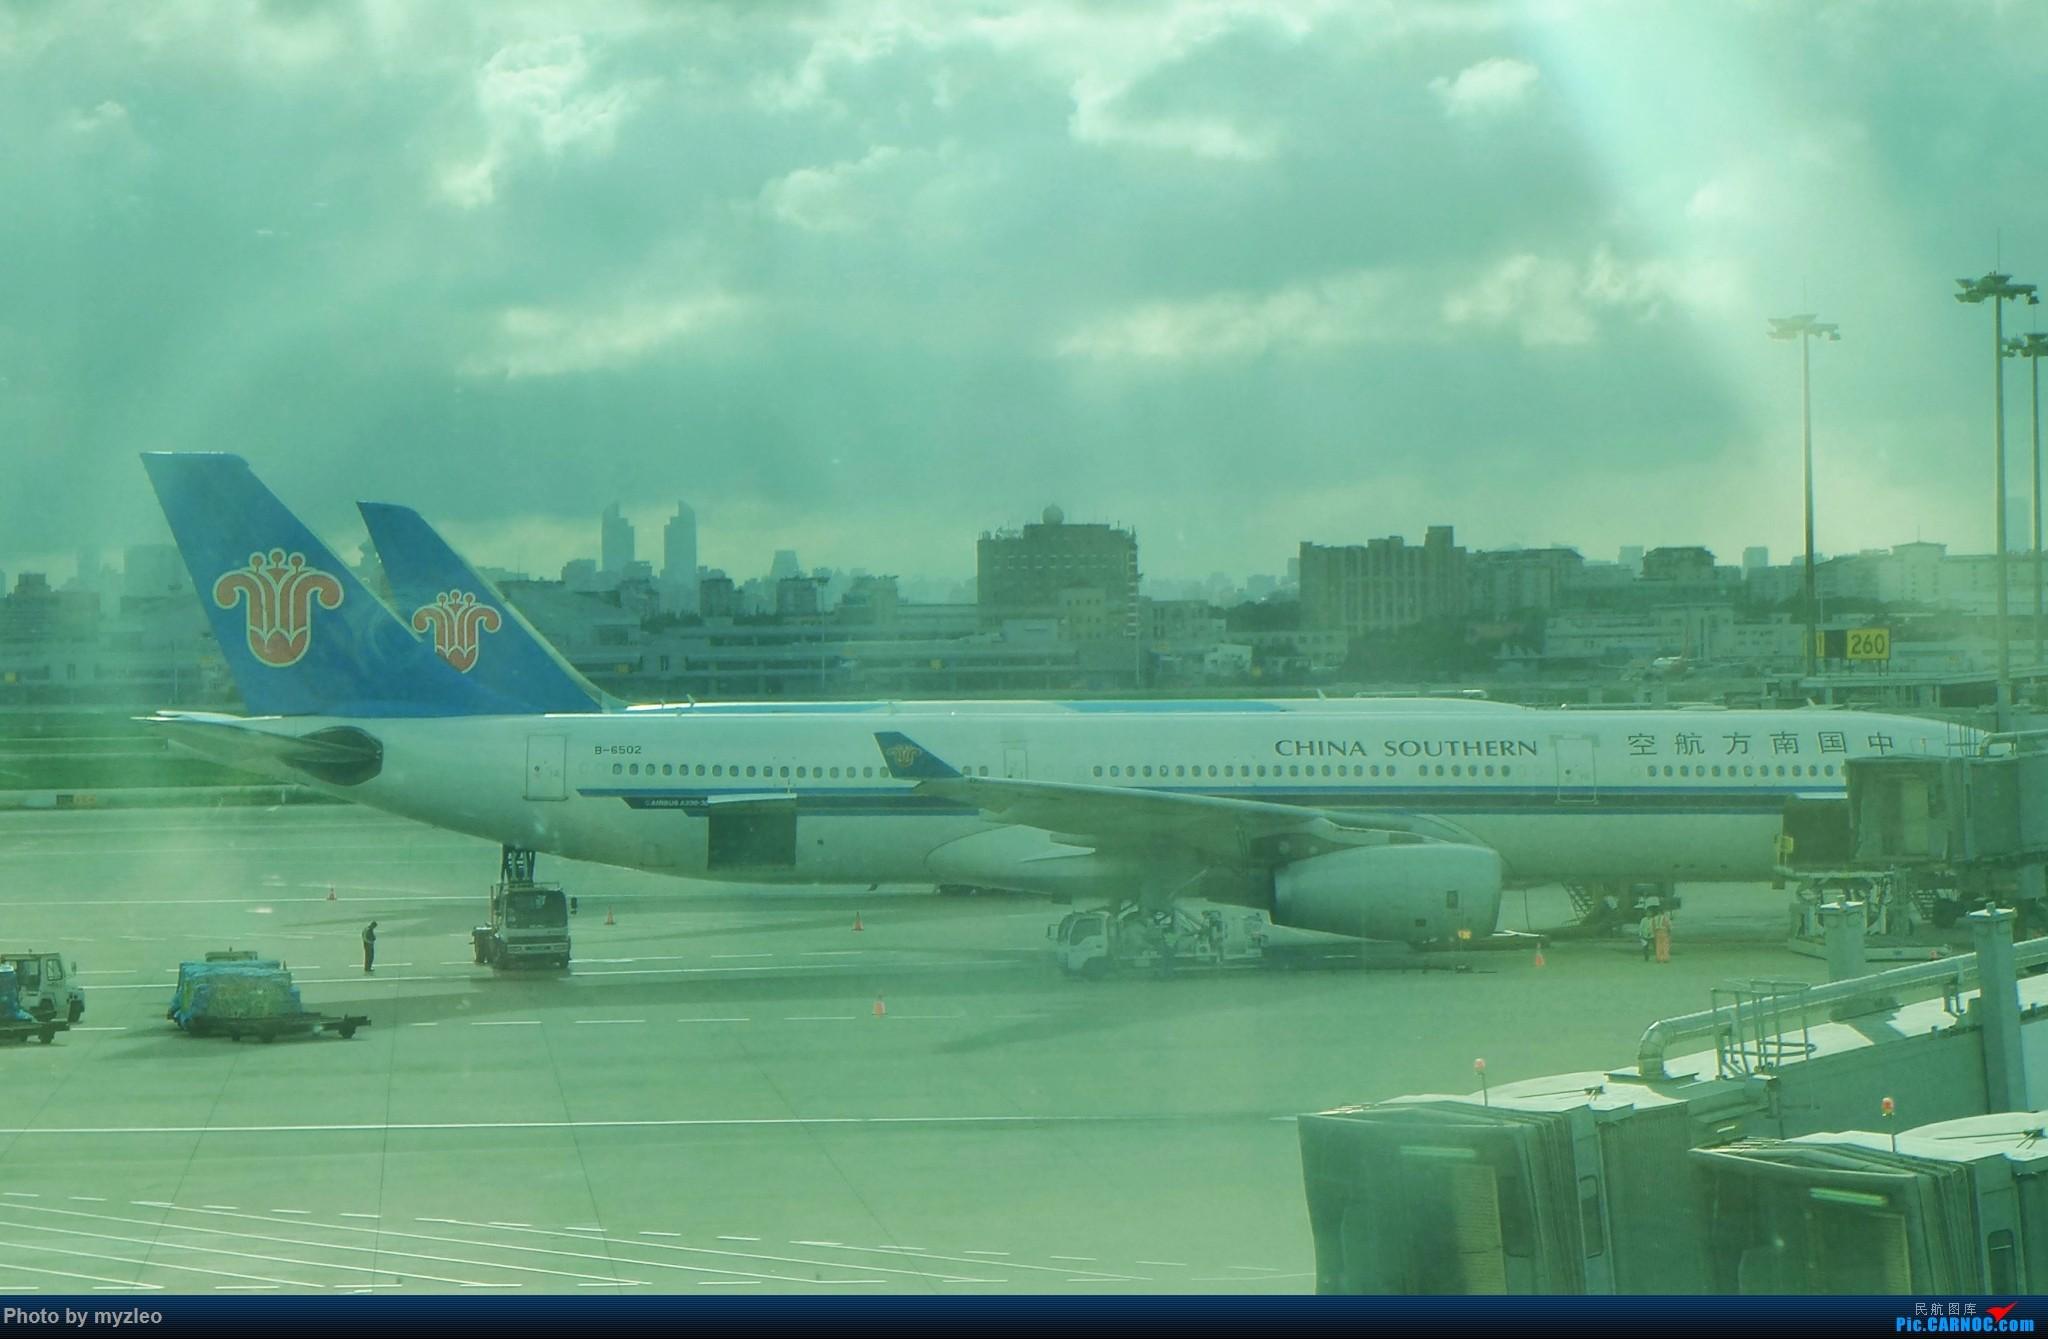 Re:[原创]【myzleo的游记3.1】三访帝都——记一次意外的惊喜,大鹅头初遇,第一次去中关村 AIRBUS A330-300 B-6502 中国上海虹桥国际机场